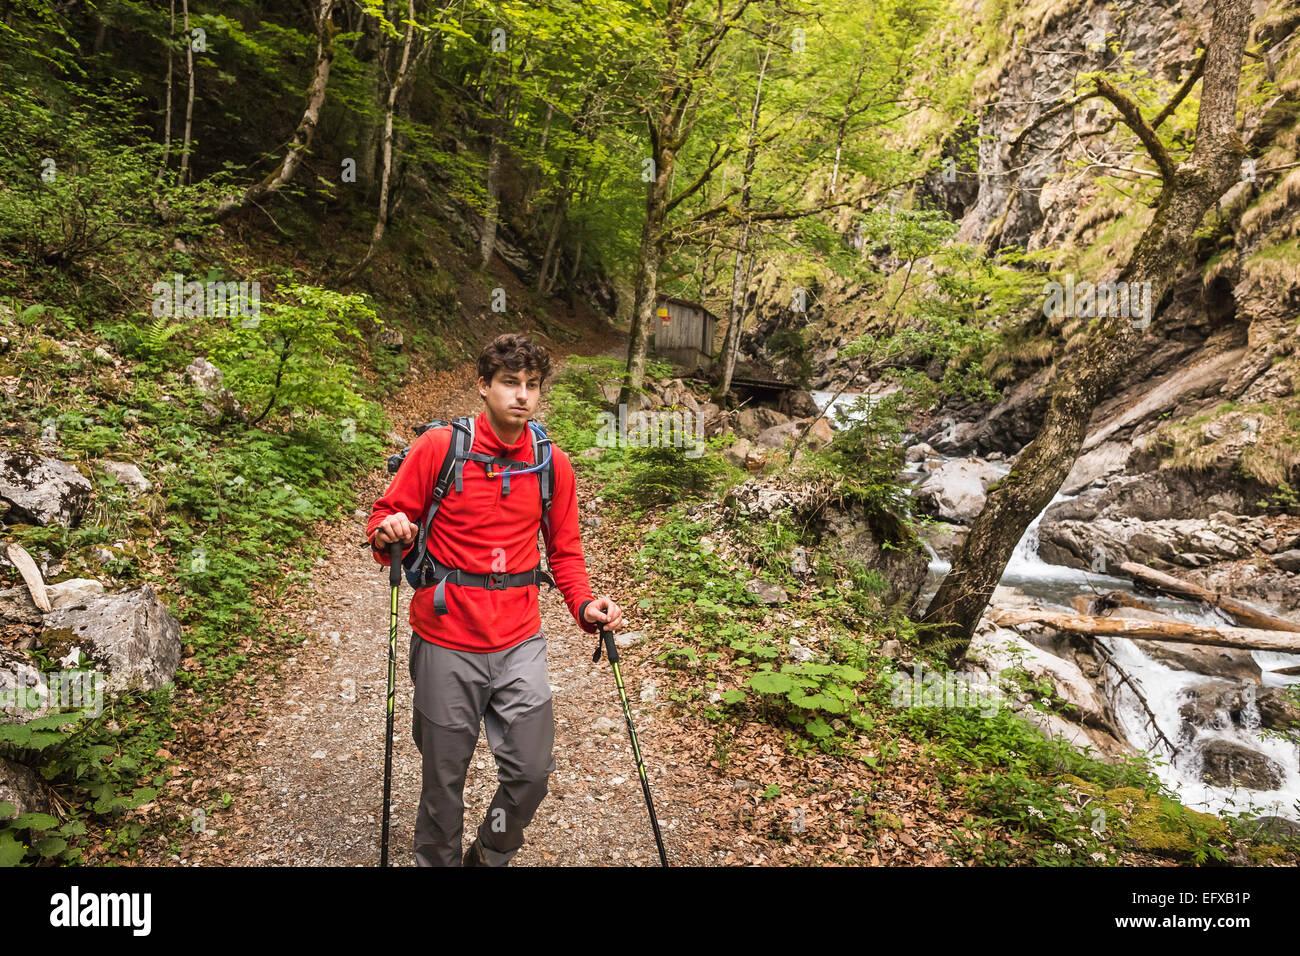 Young man hiking on river path, Oberstdorf, Bavaria, Germany Stock Photo